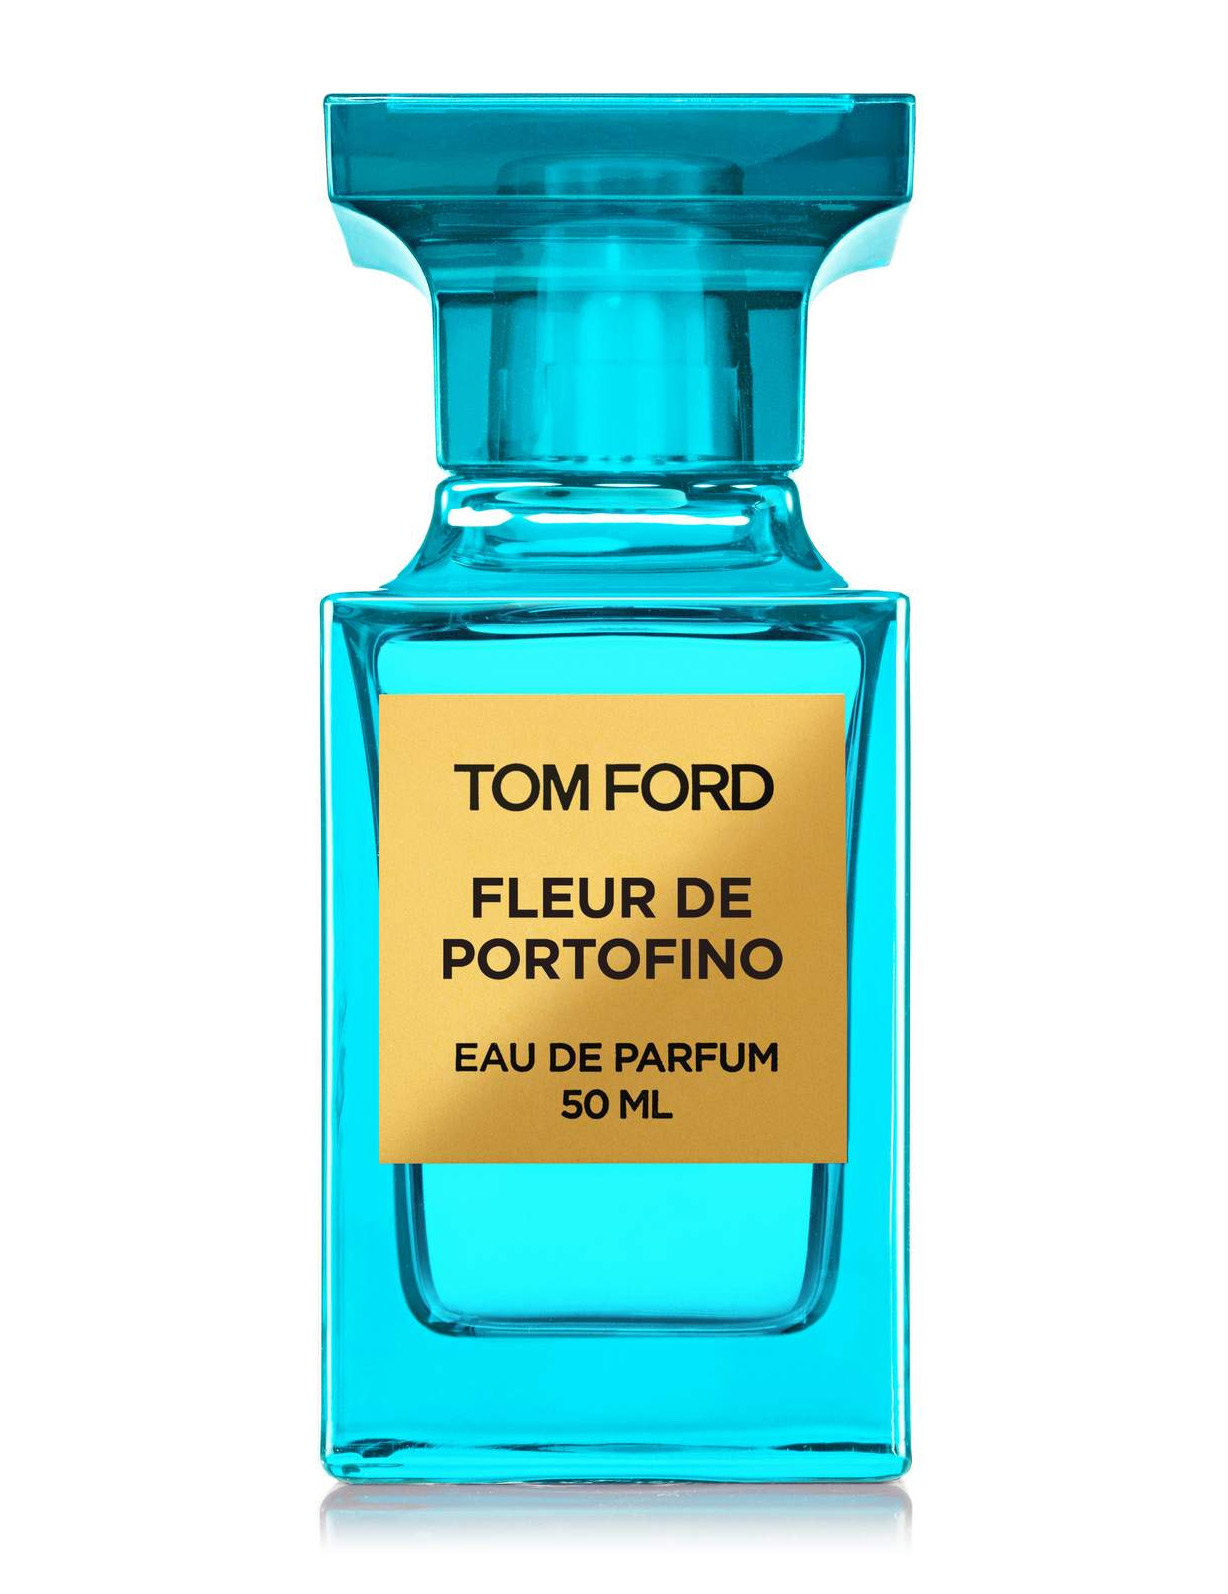 Tom Parfums ~ Nouveaux Fleur Portofino Ford De oWdBCrxe